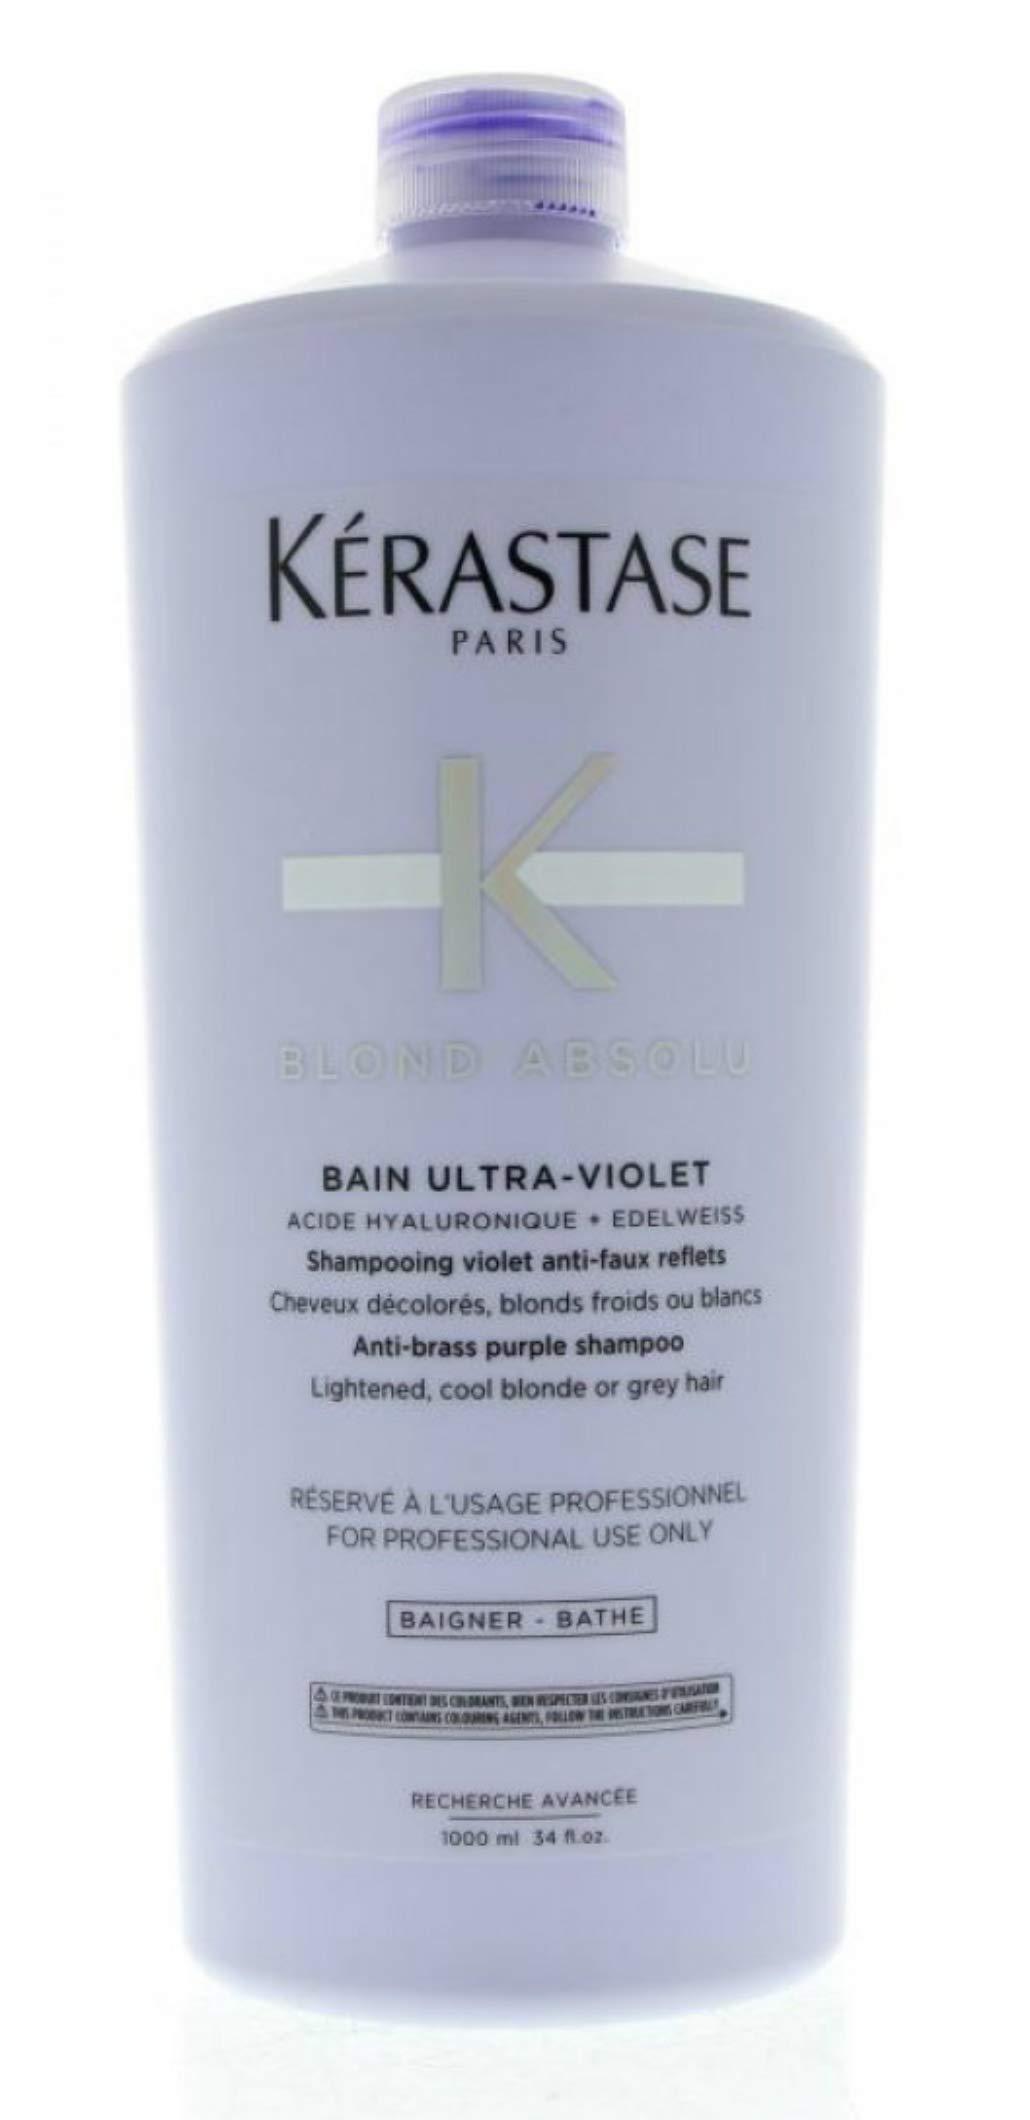 Kerastase Bain Ultra-Violet Purple Shampoo 34 oz